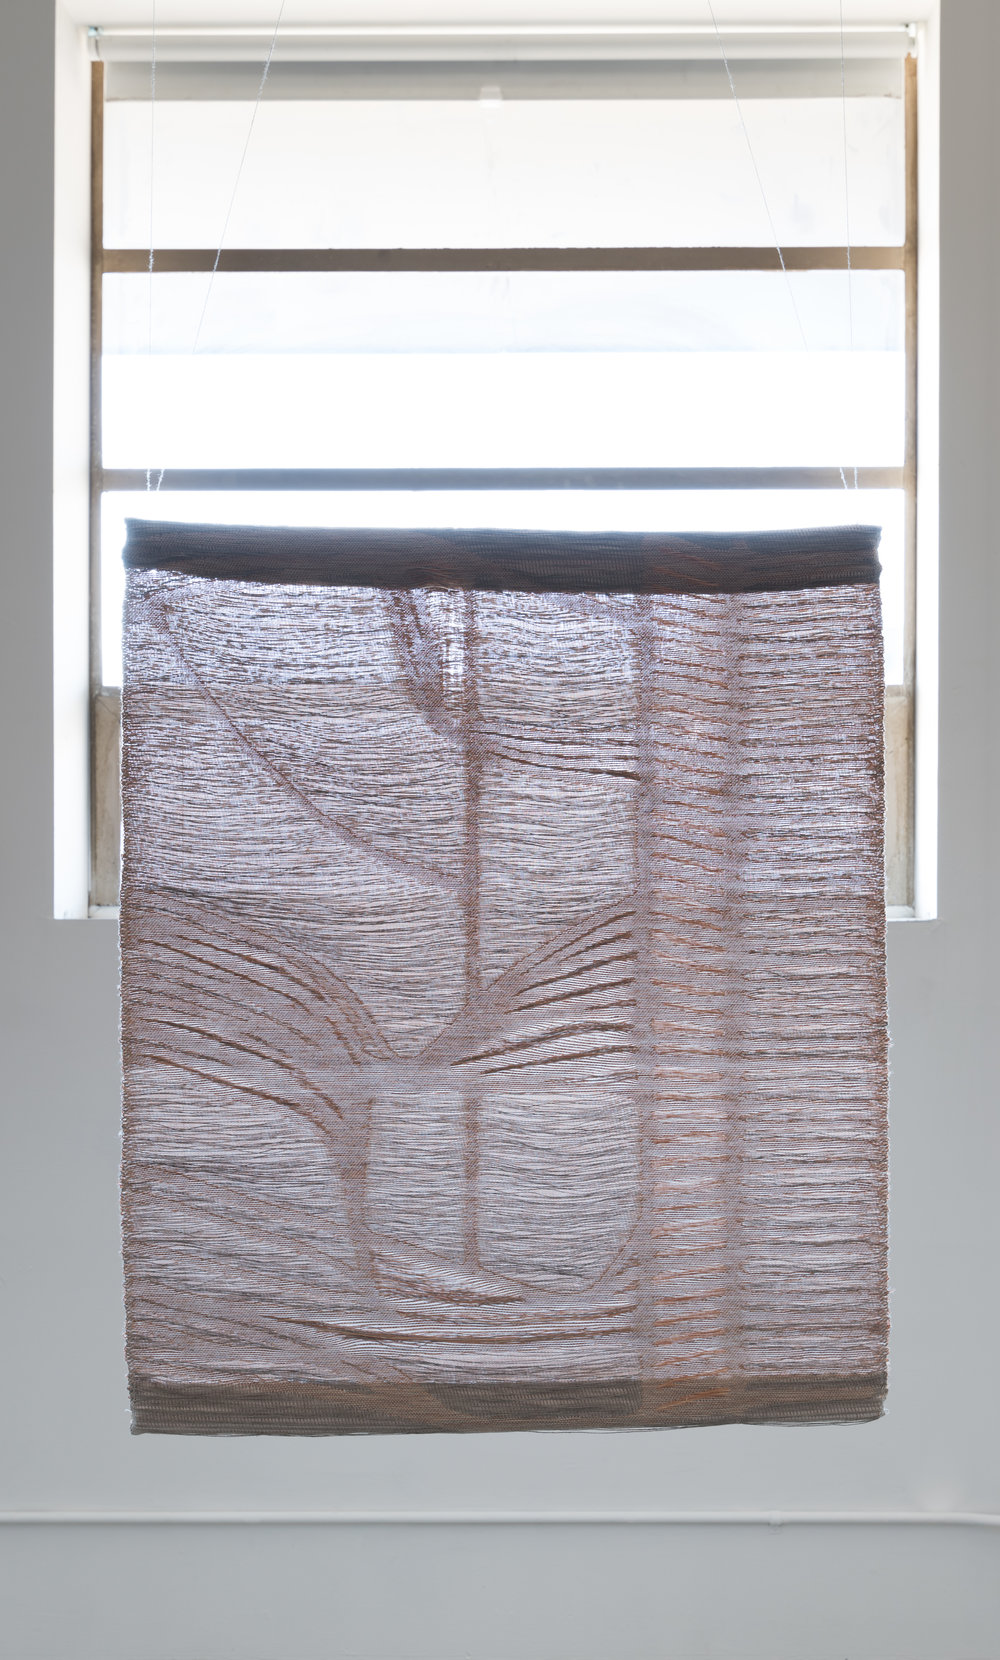 2017  [FRONT view] digital jacquard weaving, linen weft: nervous system